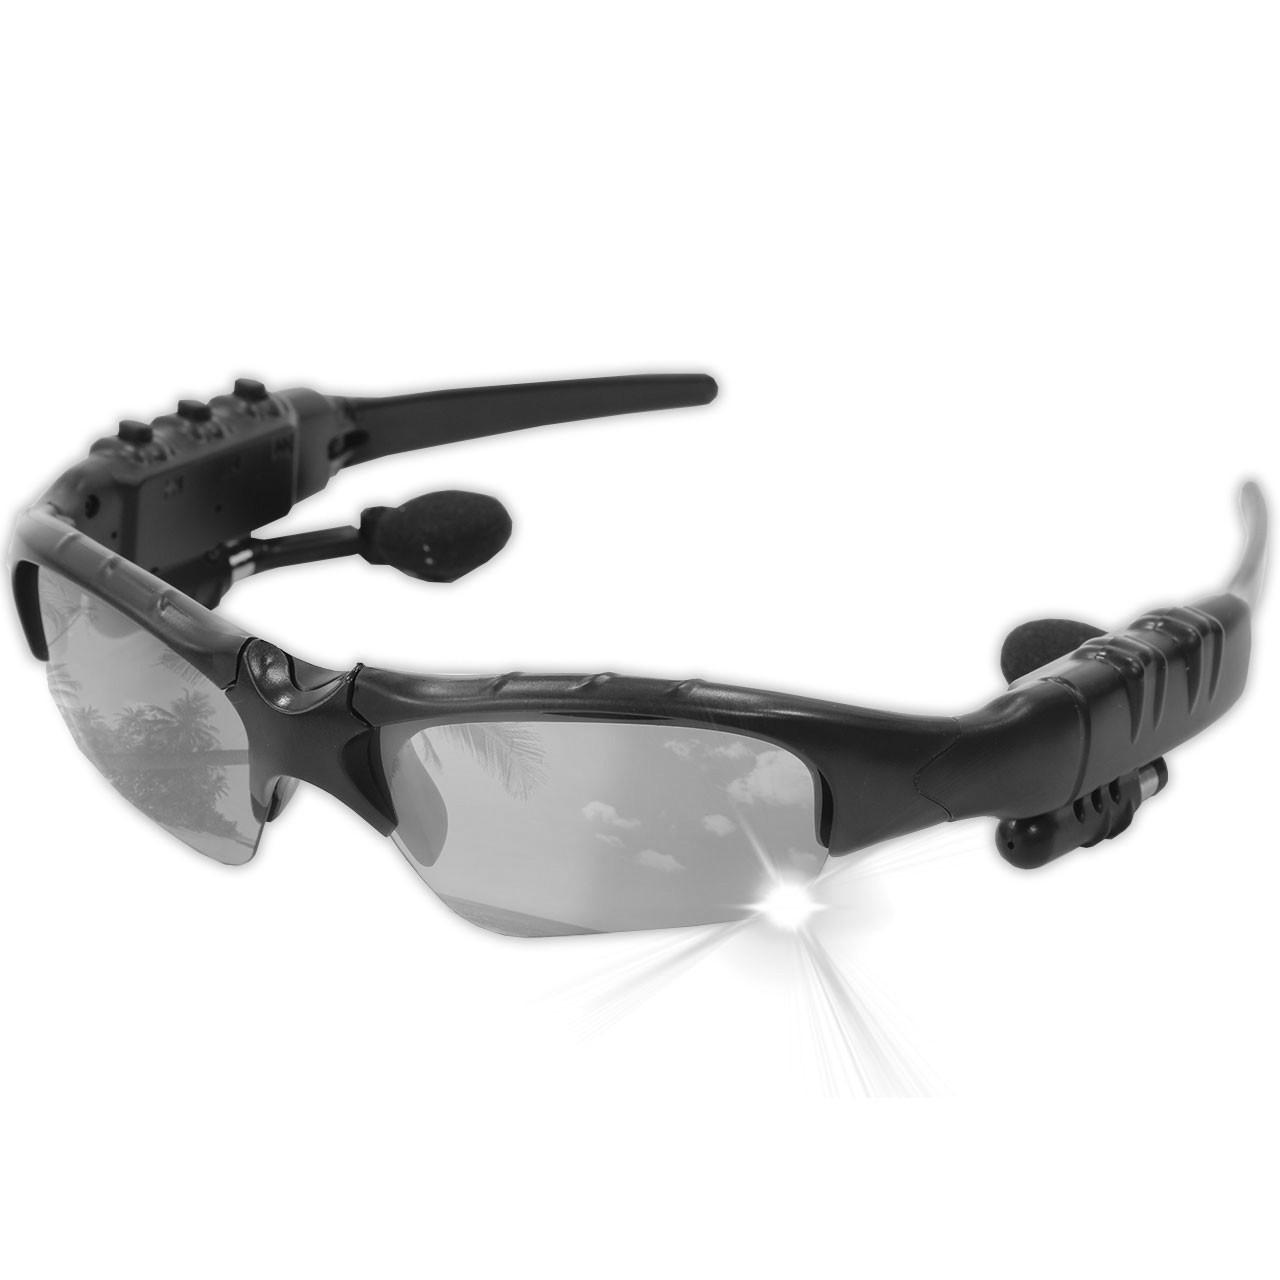 ☀Bluetooth гарнитура очки Lesko LK-086 Black солнцезащитные плеер наушники mp3 блютуз 4.1 батарея 100 мАч